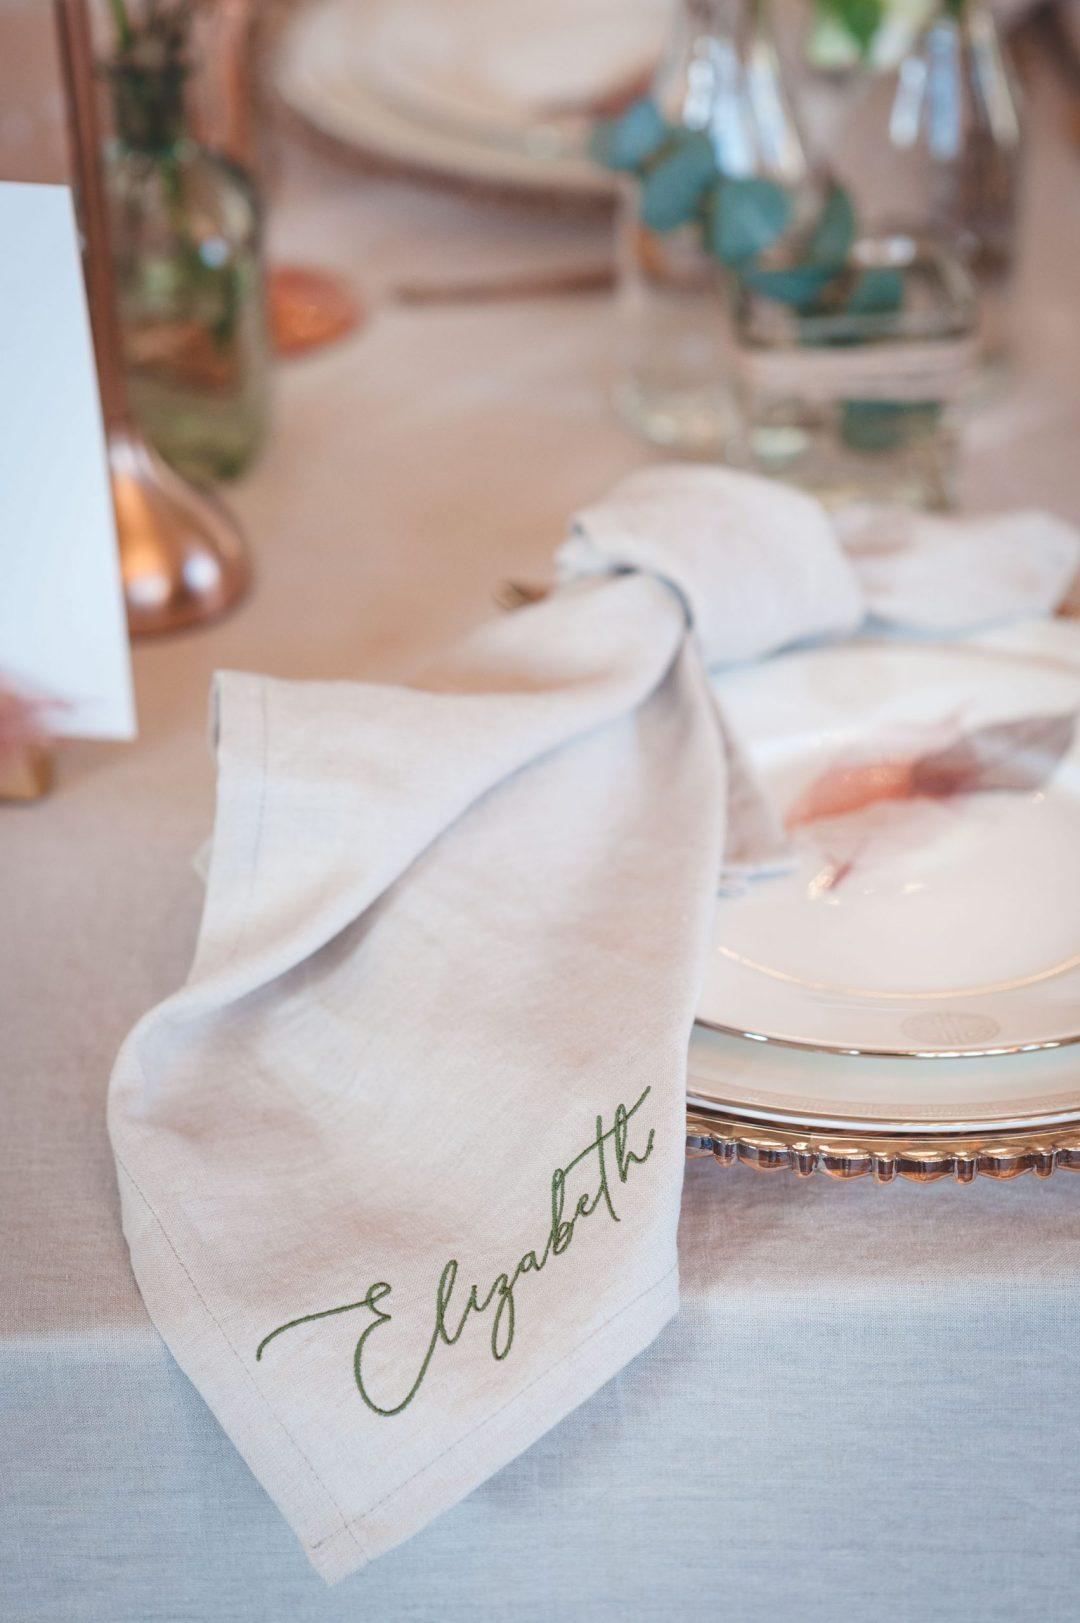 Embroidered linen napkin